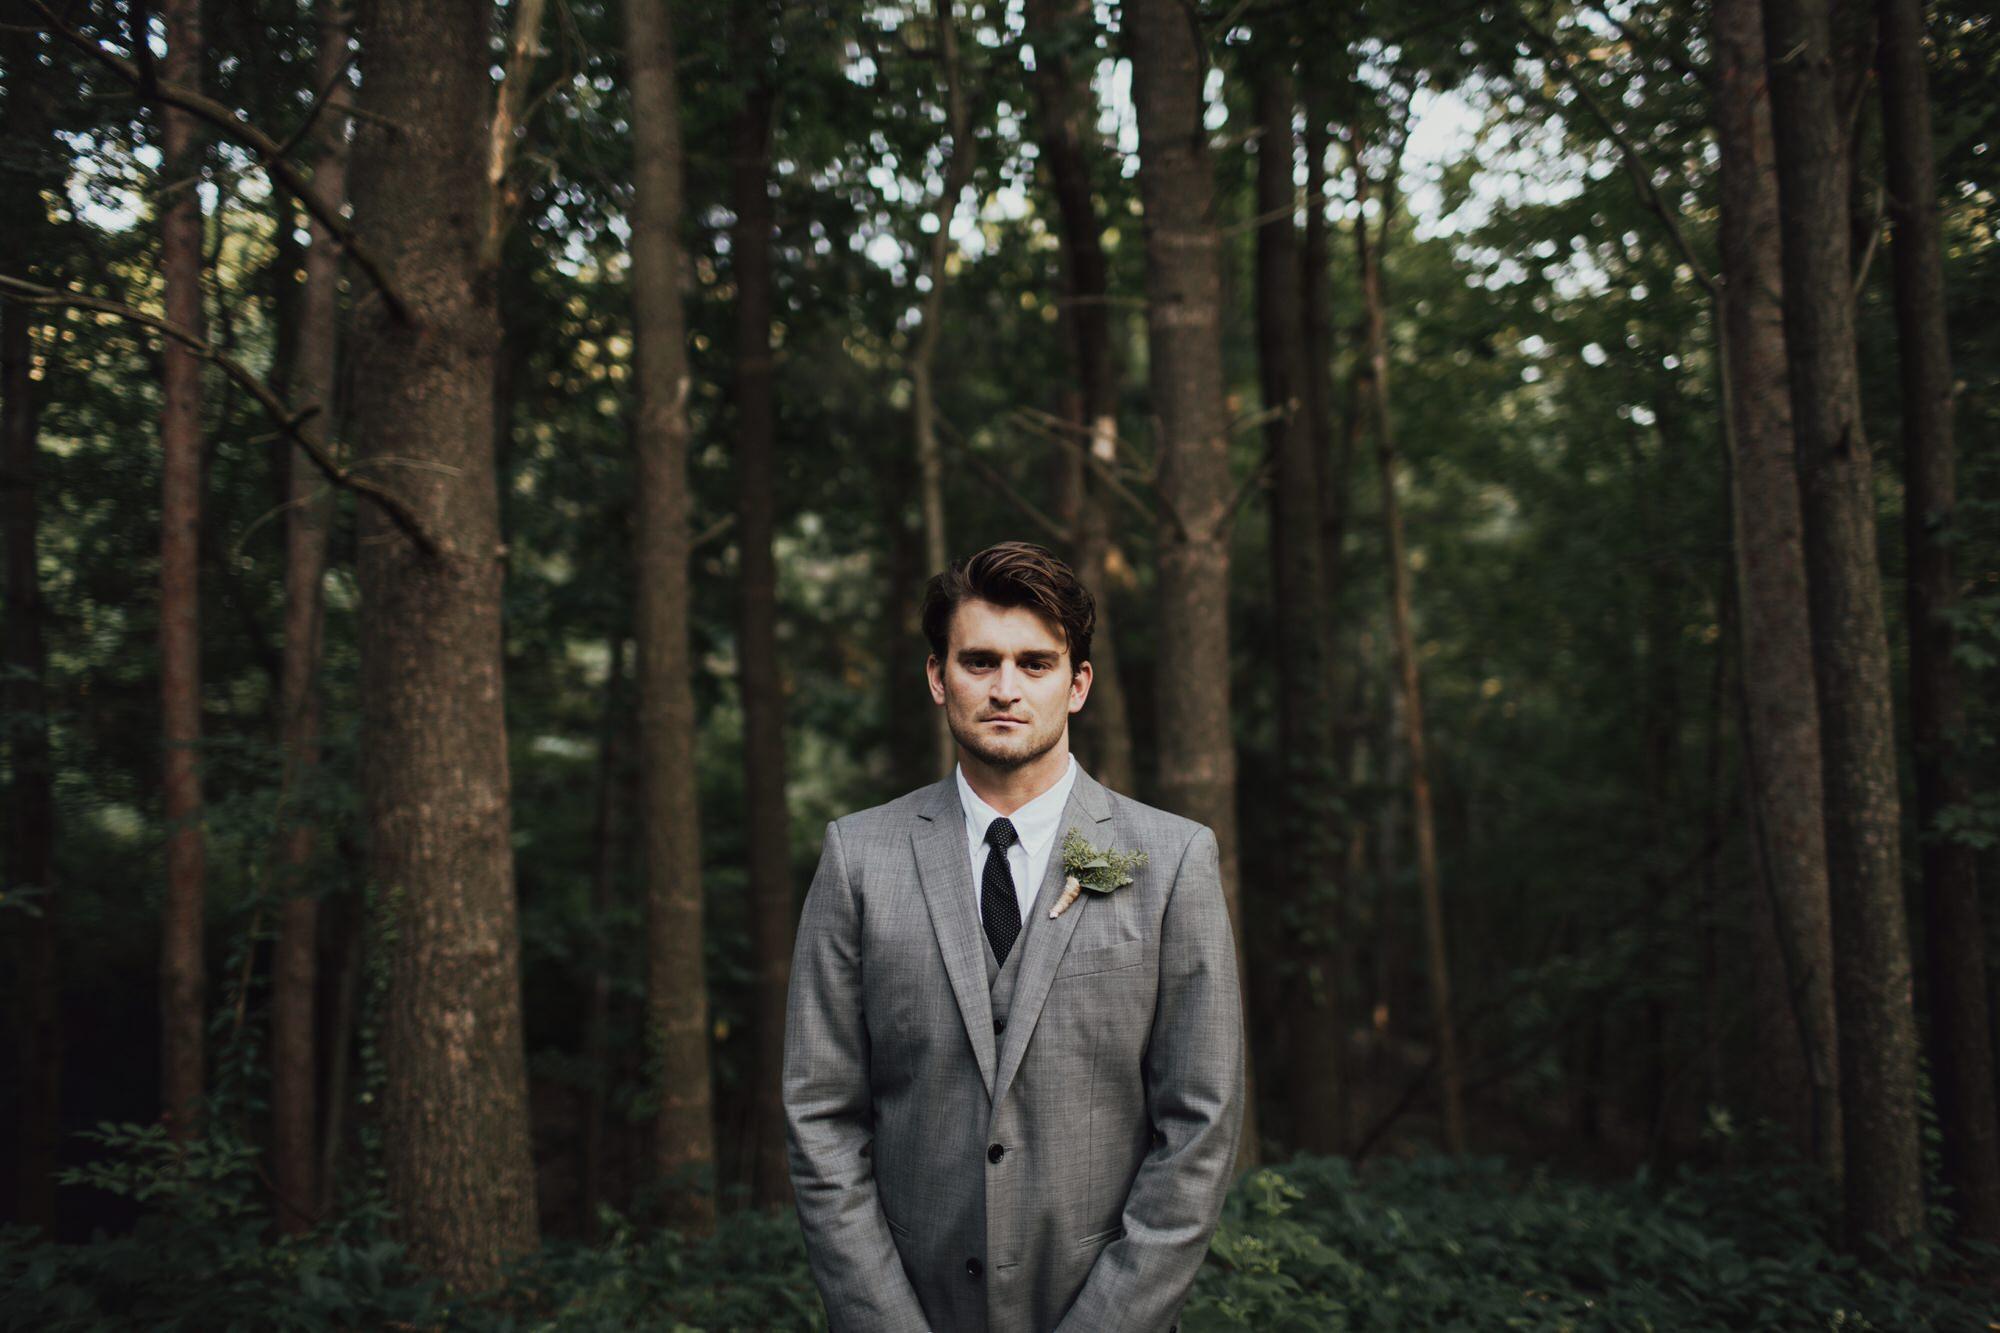 emily-aaron-rochester-new-york-wedding-photographer-108.JPG